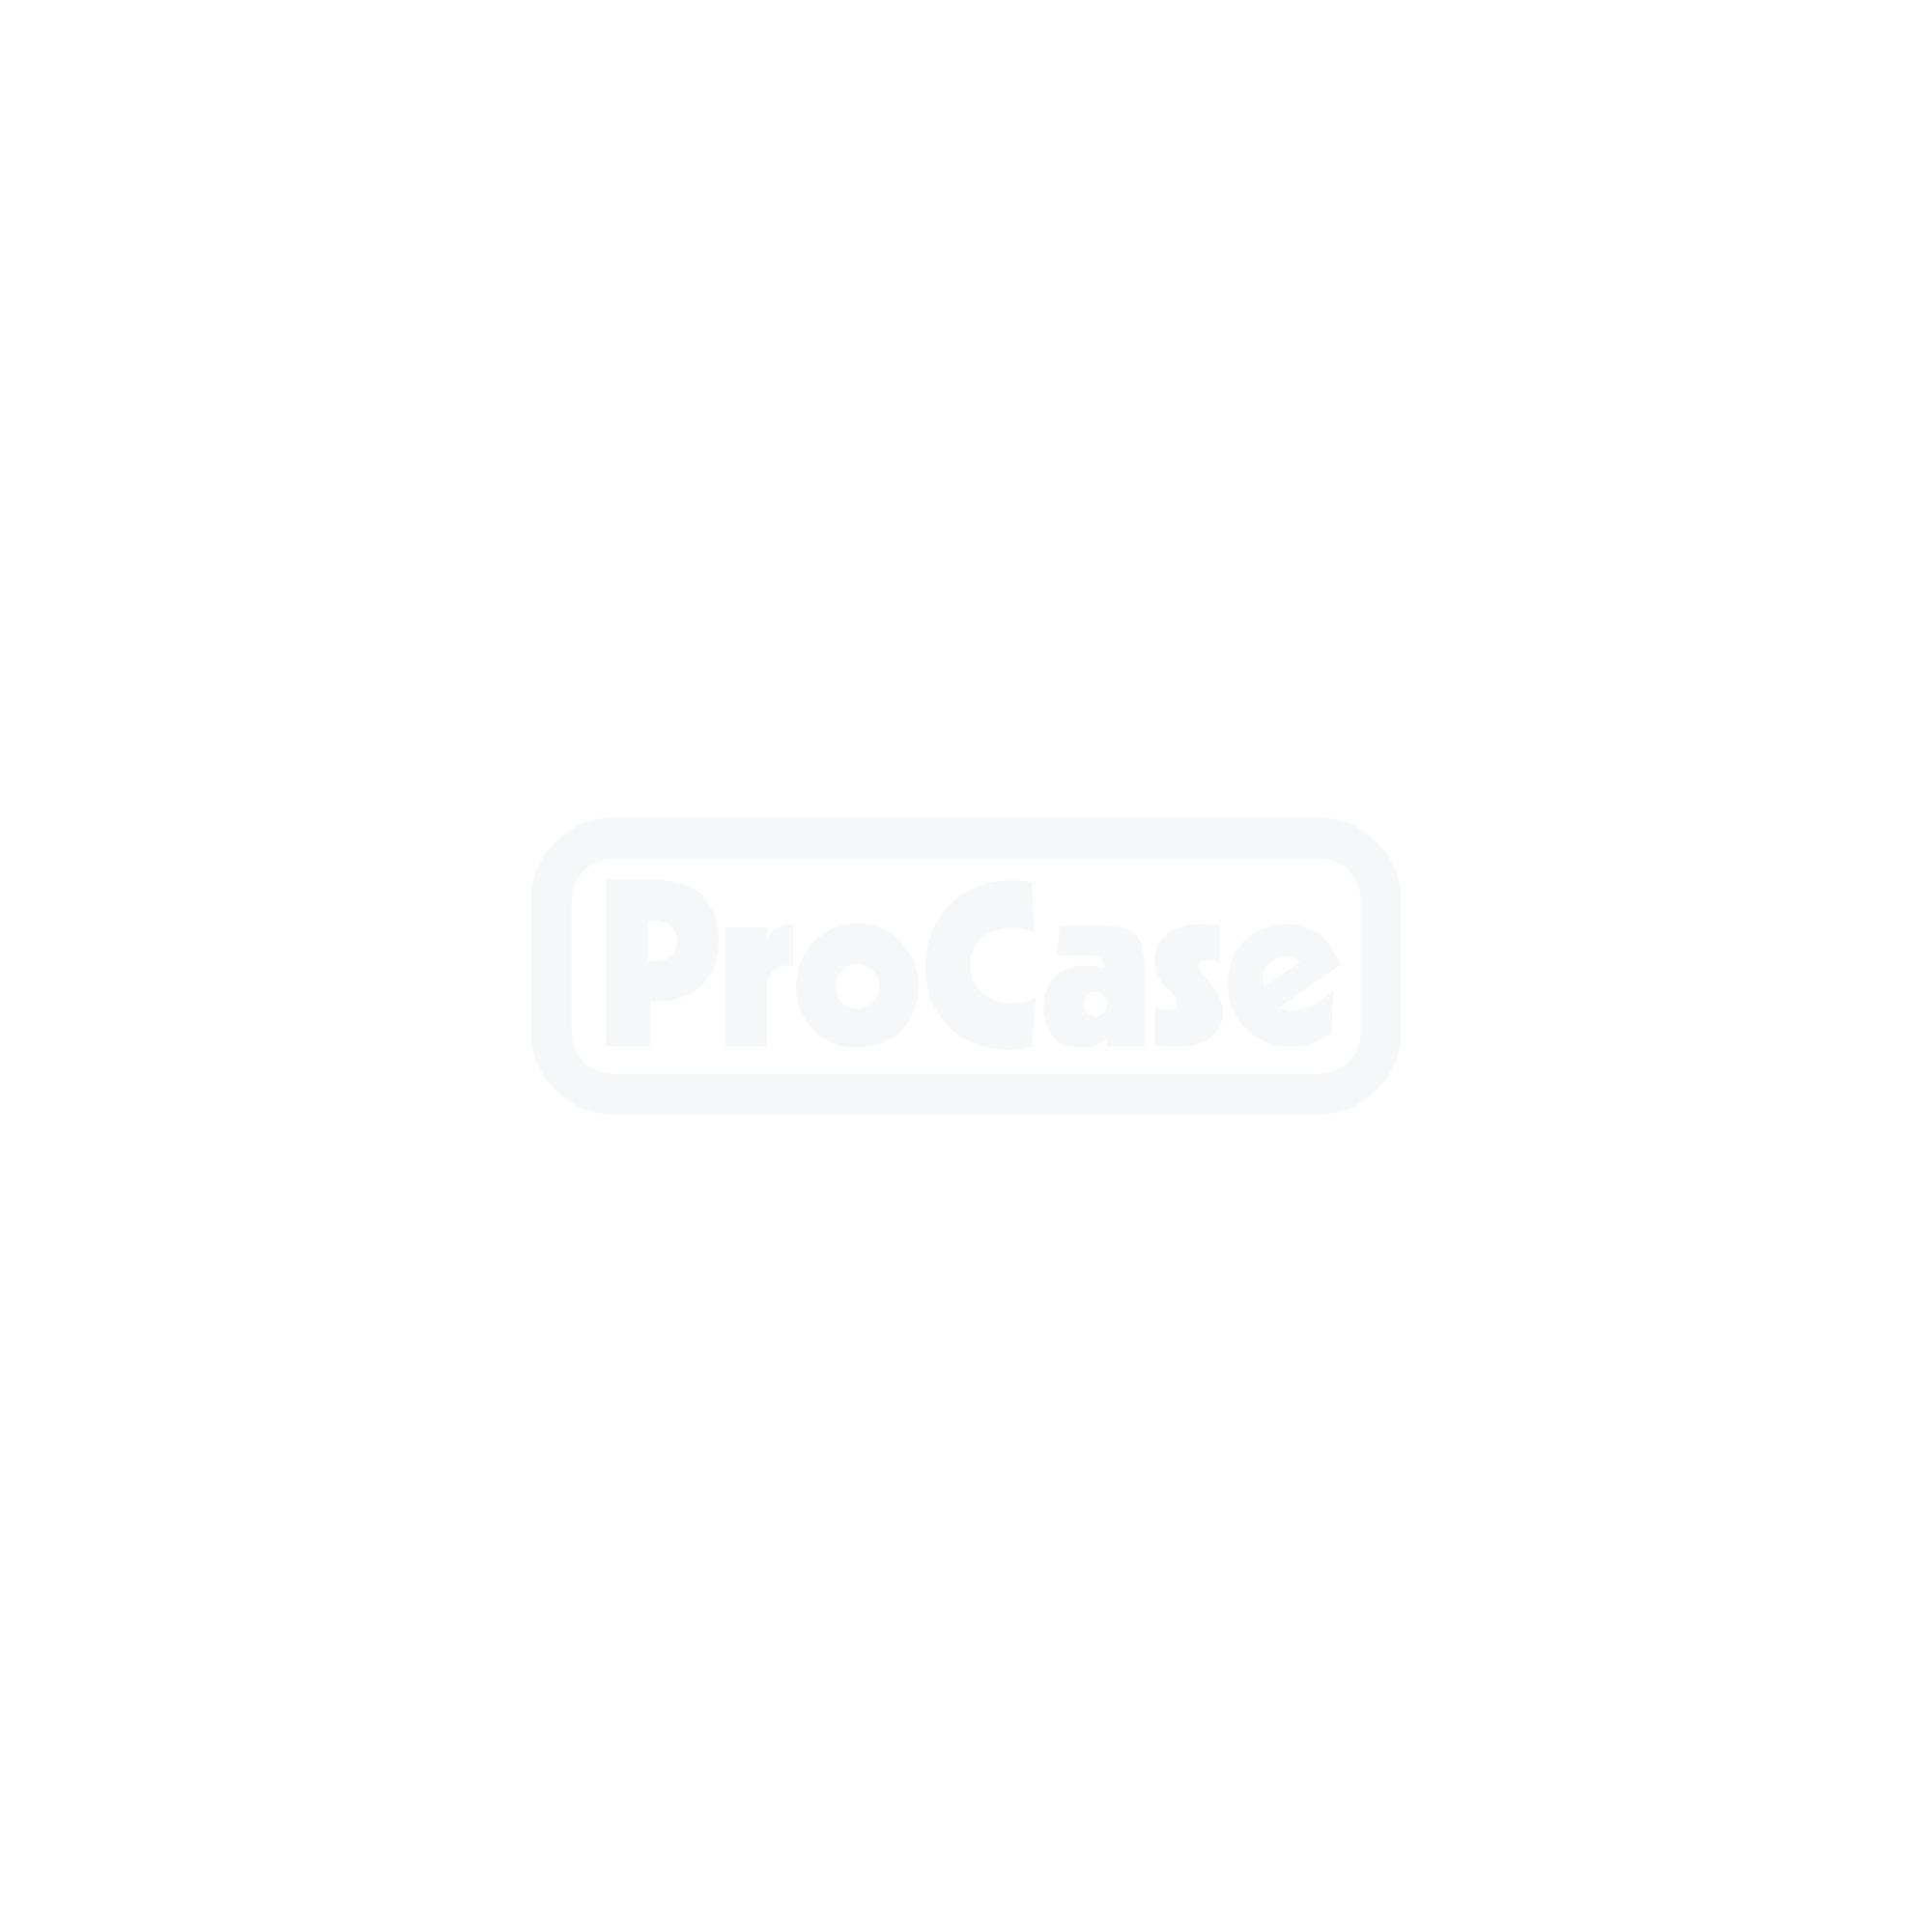 SKB 3i Koffer 2617-12B mit Rasterschaumstoff